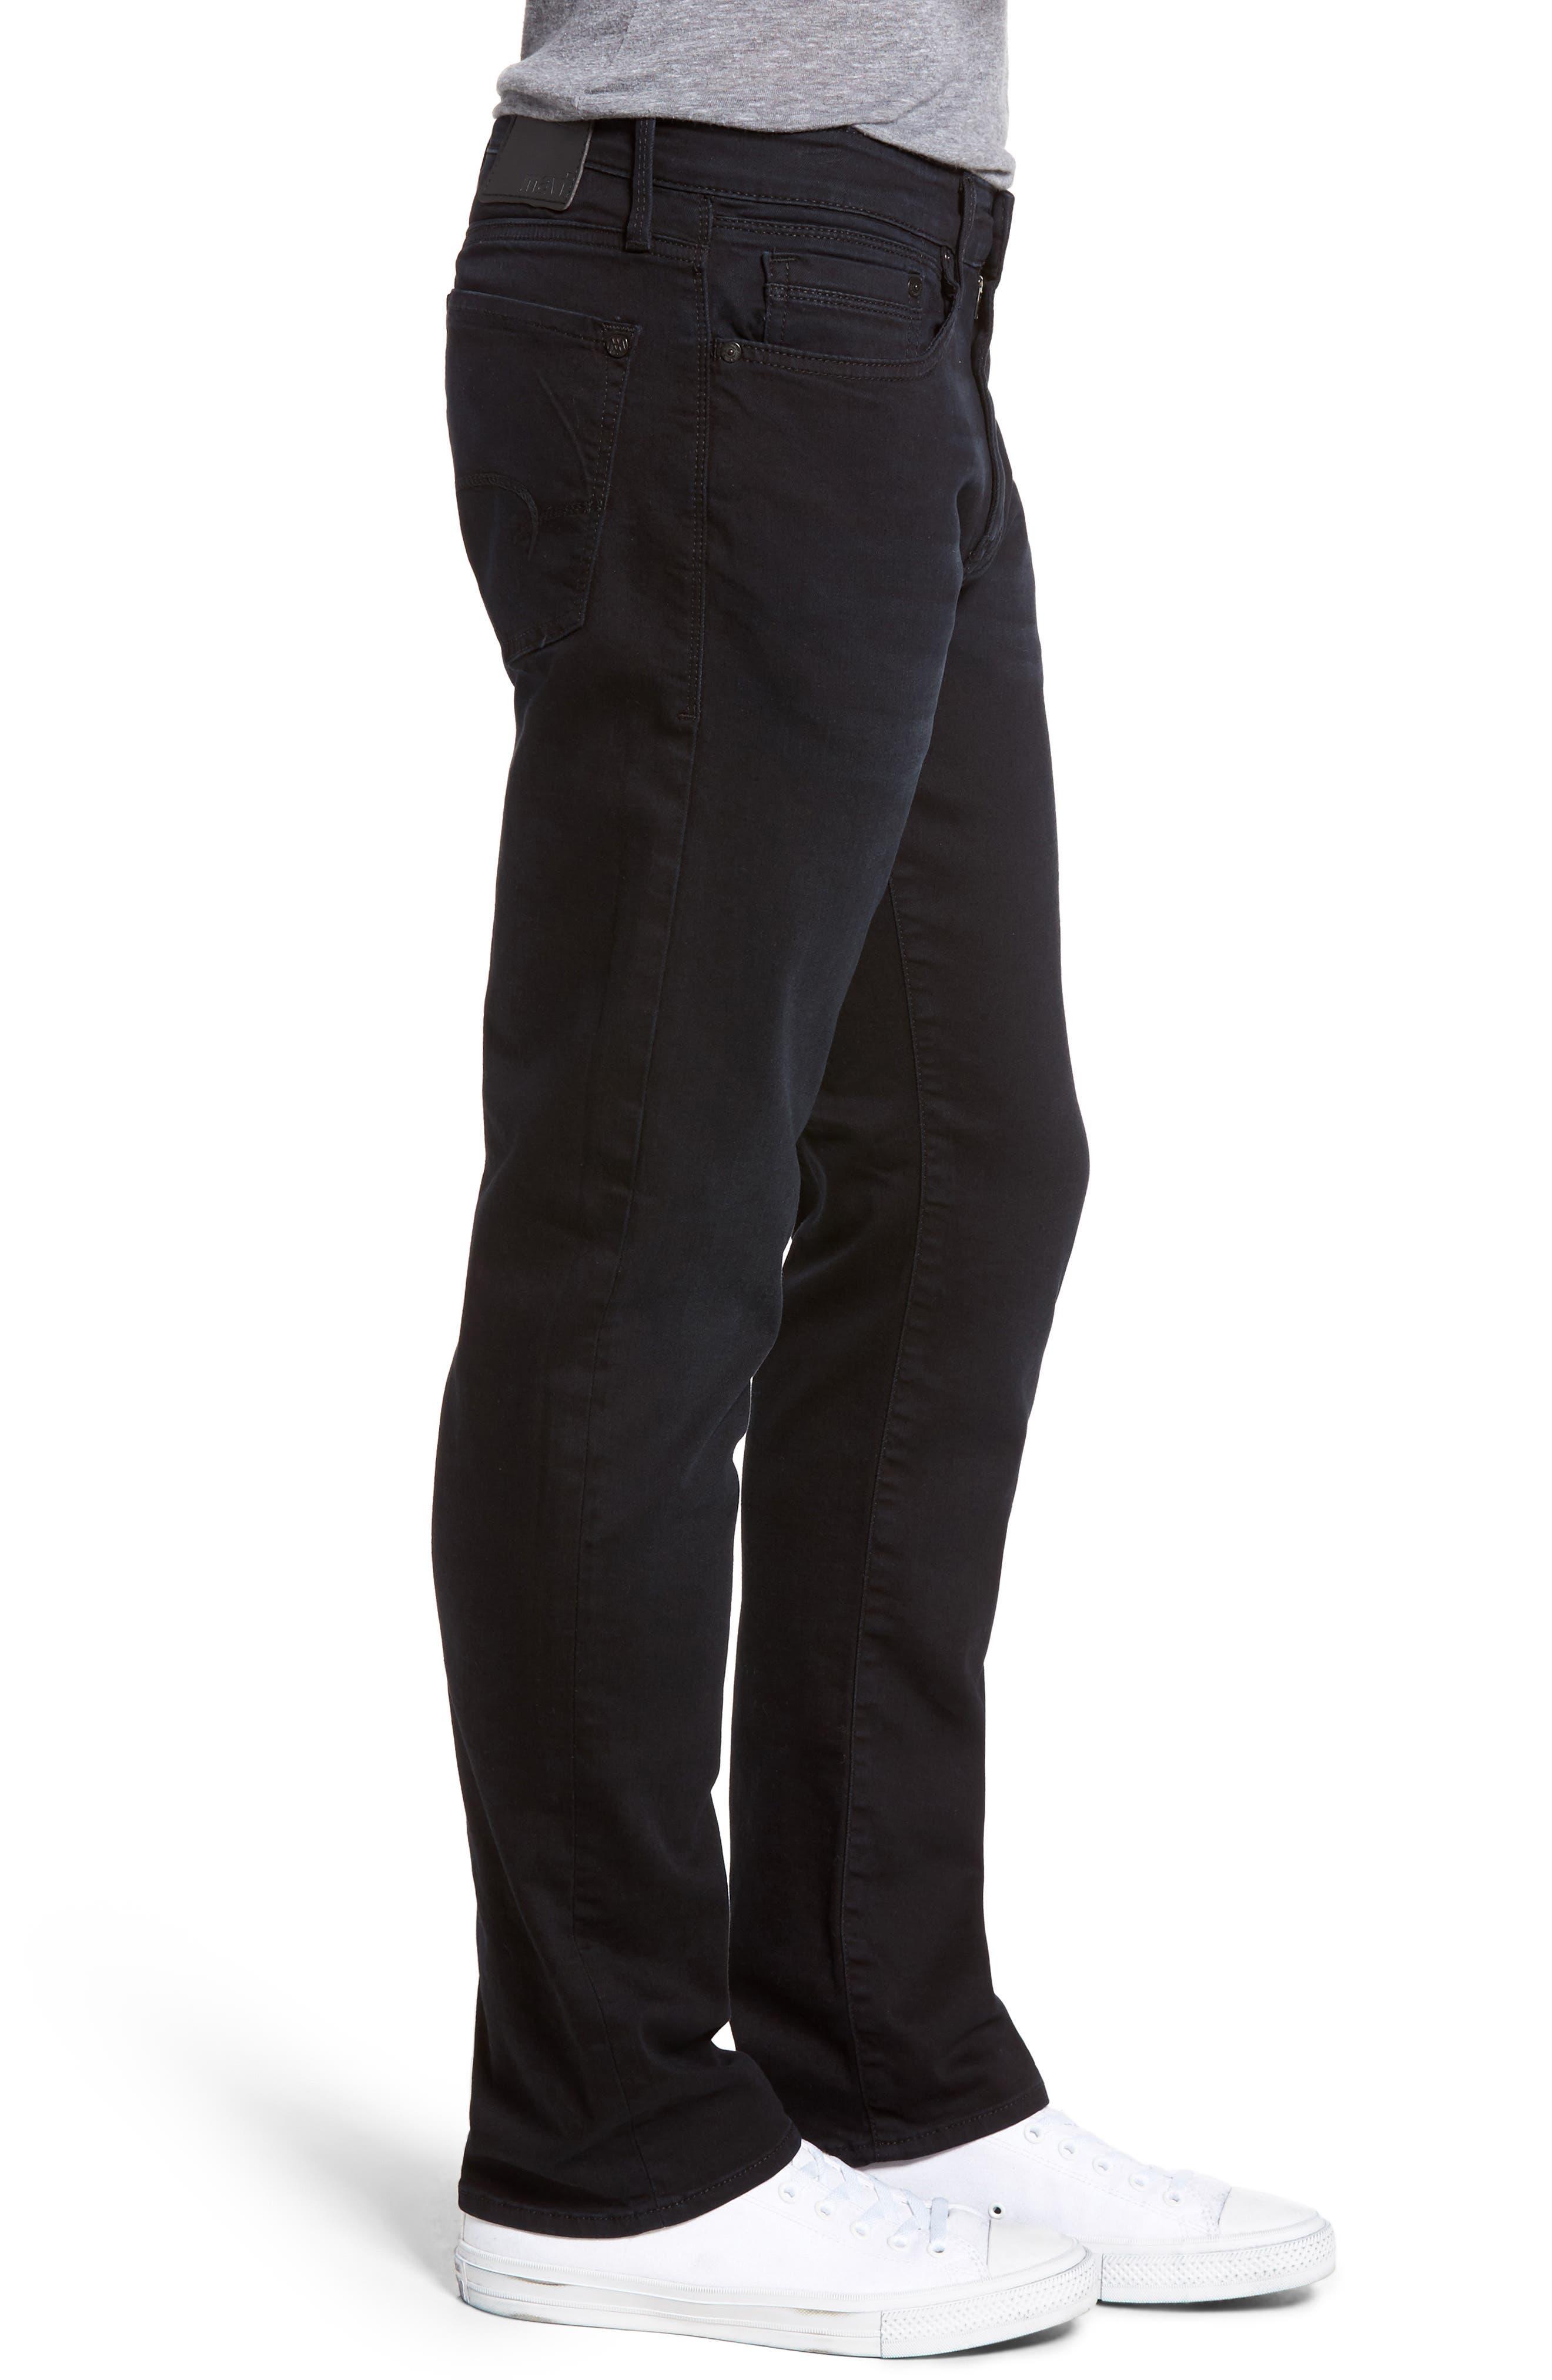 Zach Straight Leg Jeans,                             Alternate thumbnail 3, color,                             401